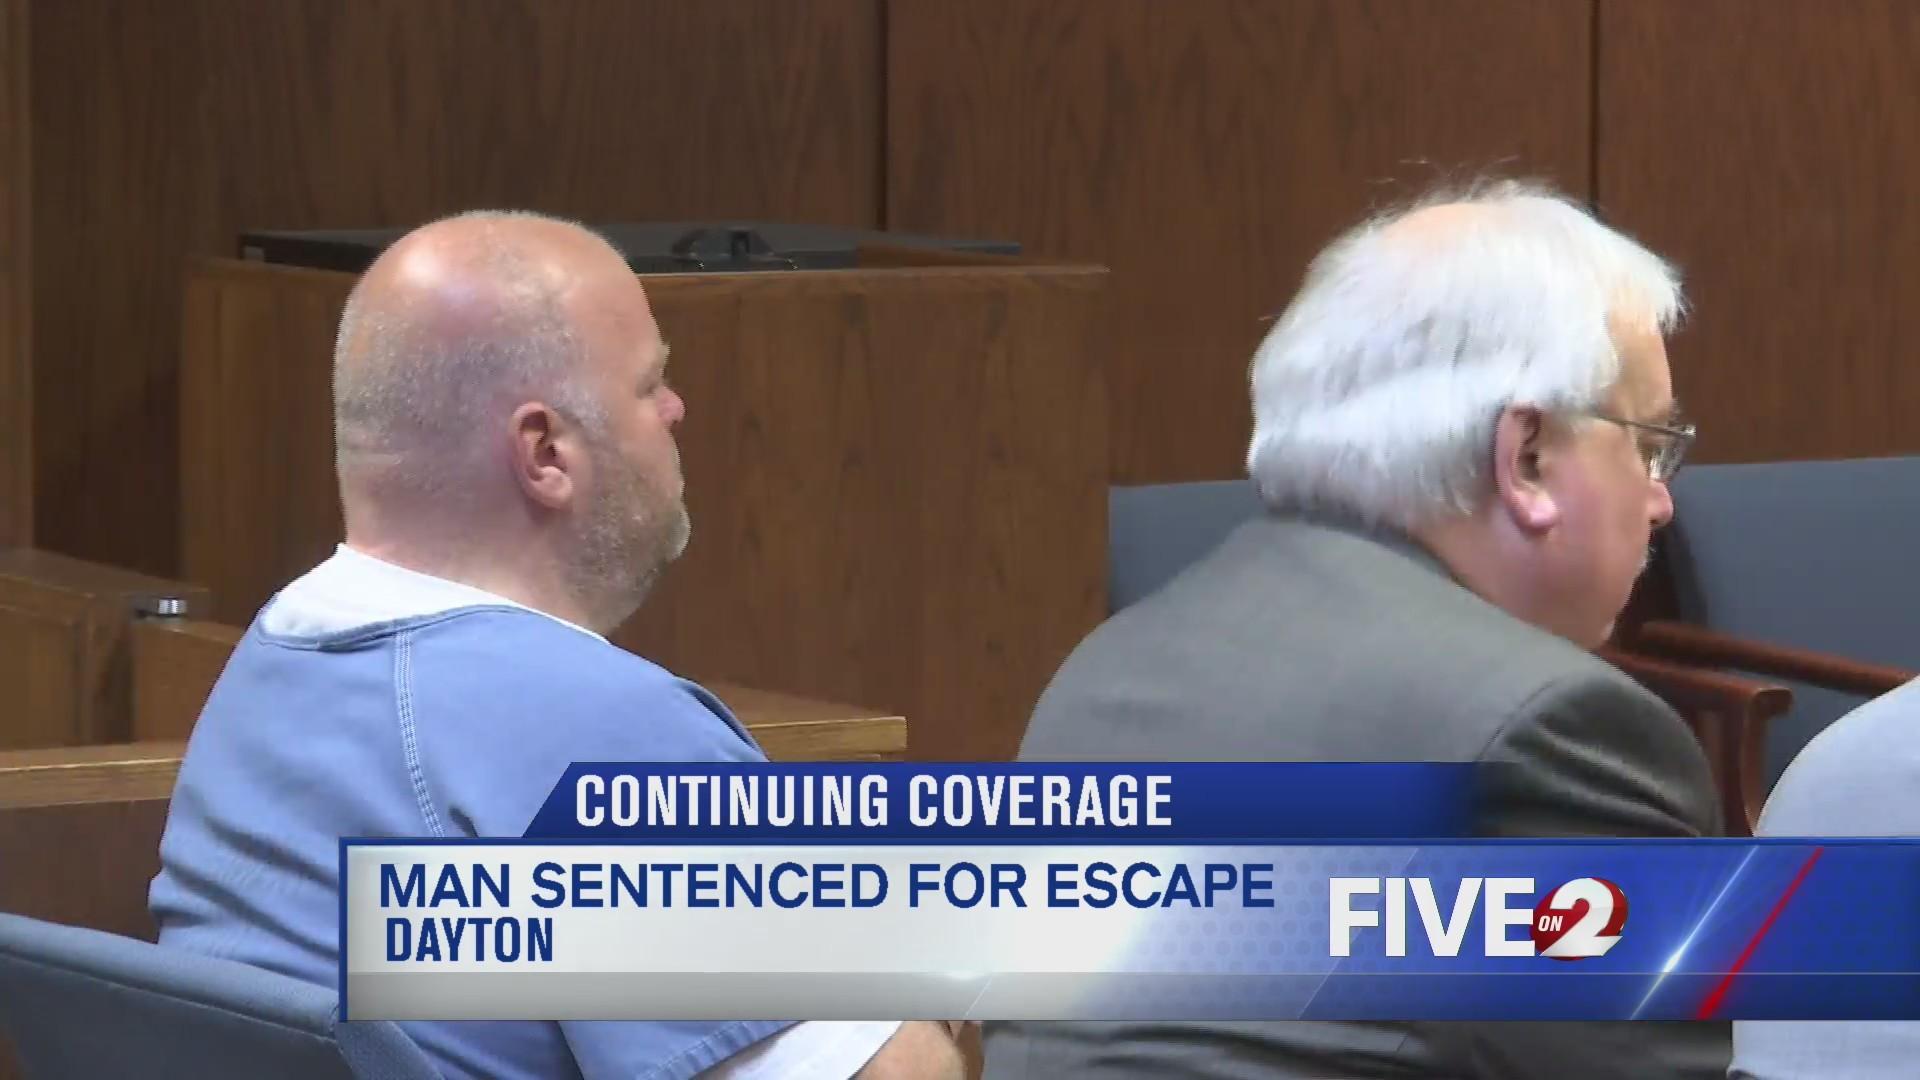 Justin Smith sentenced for escape